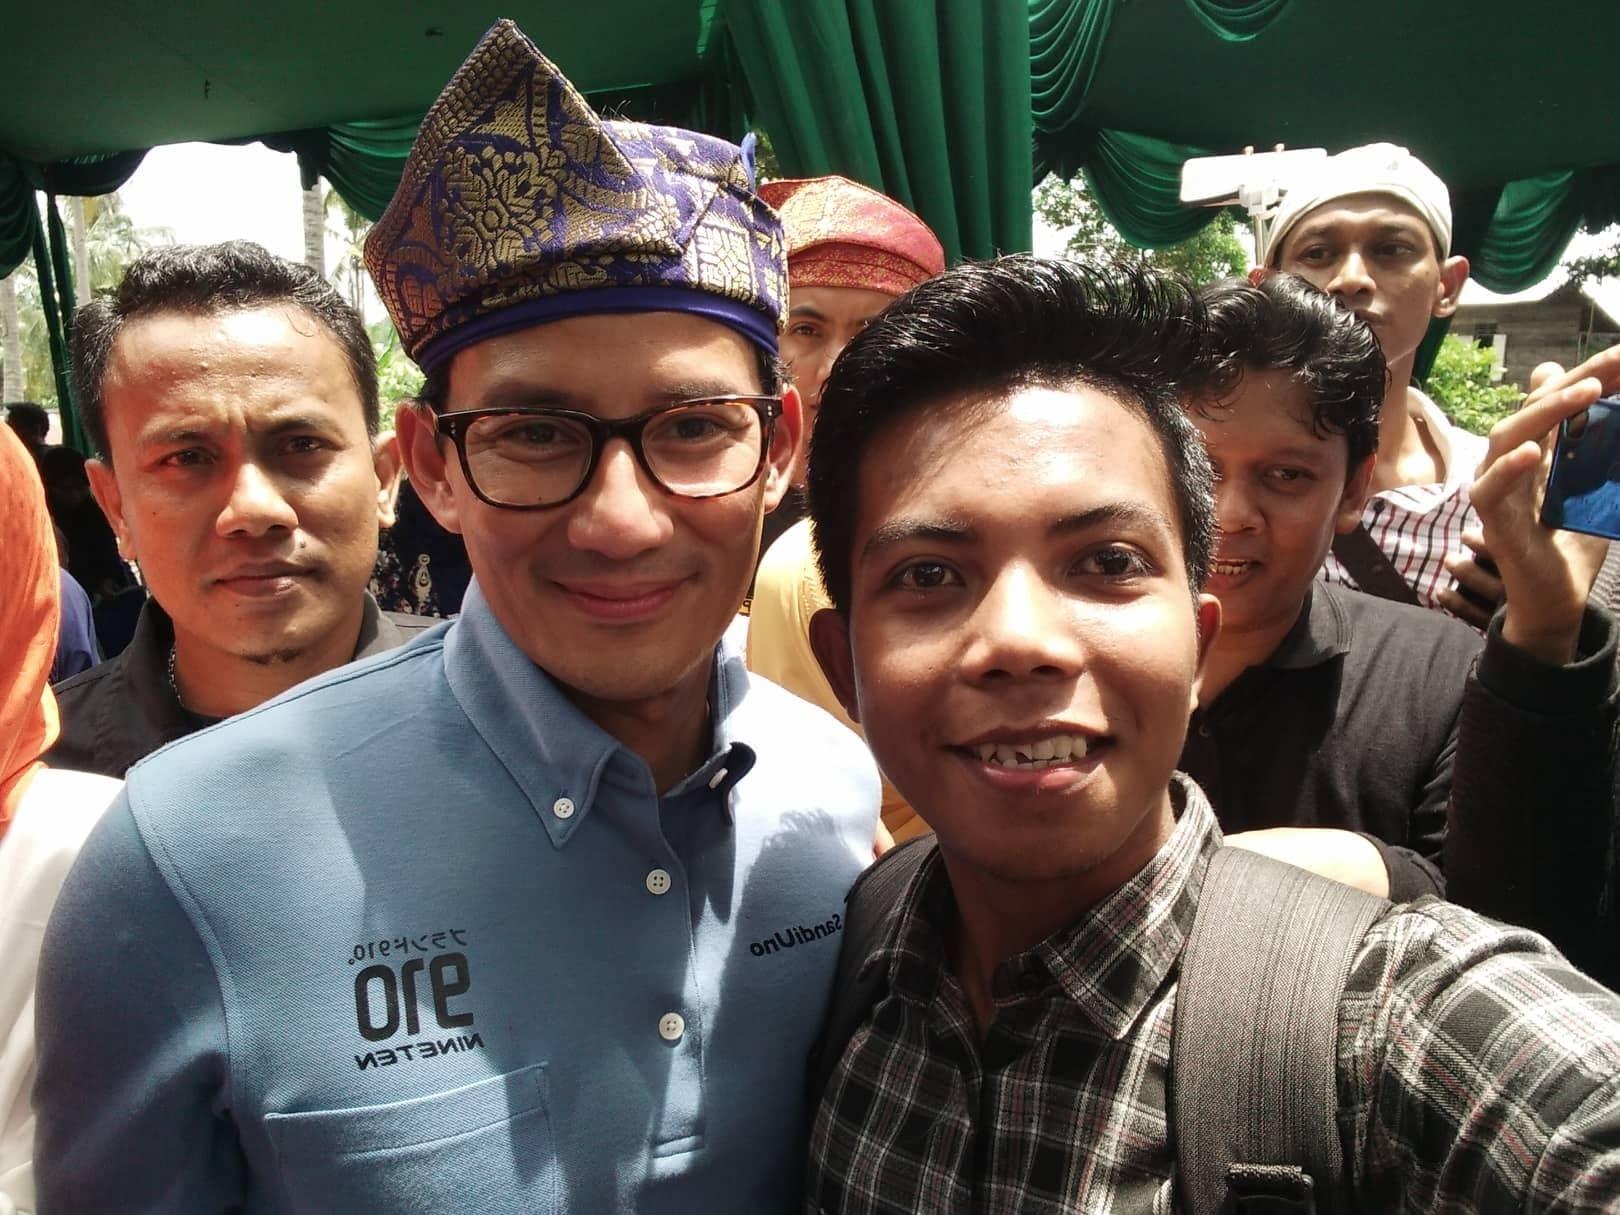 Prestasi anak negeri bojumpo dengan Calon Wakil Presiden RI